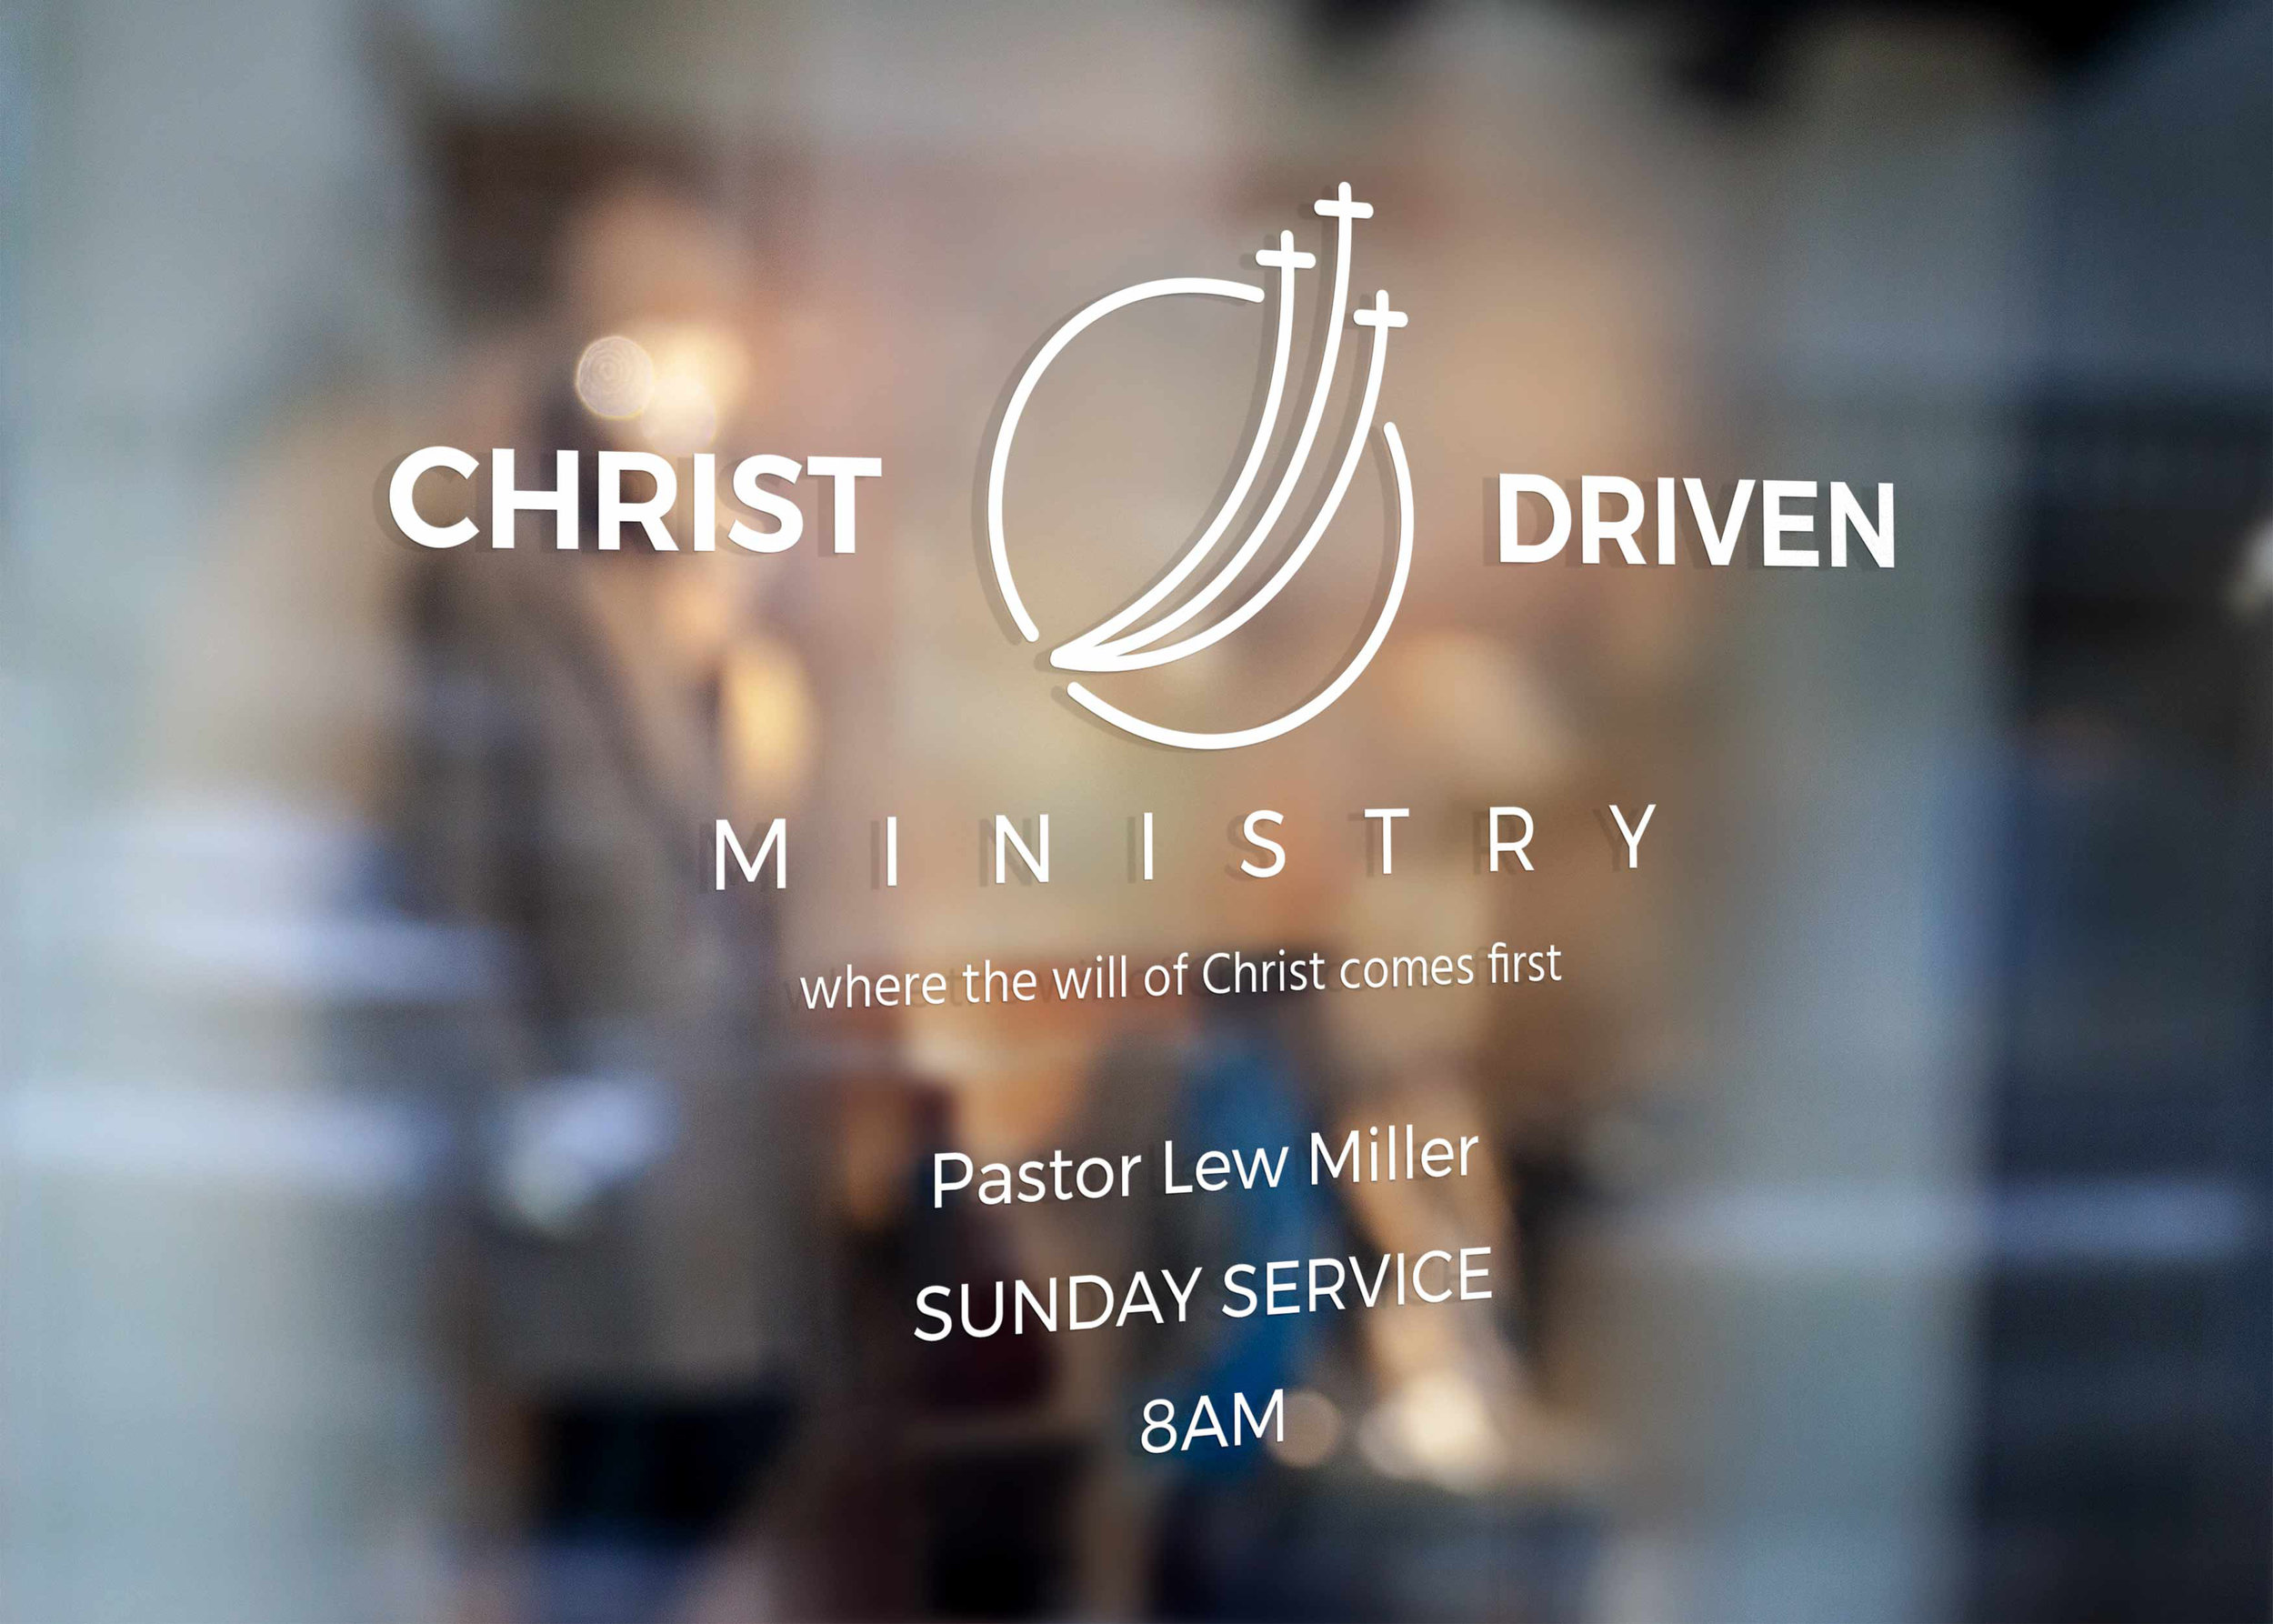 Christ-Driven-Window-Signage.jpg